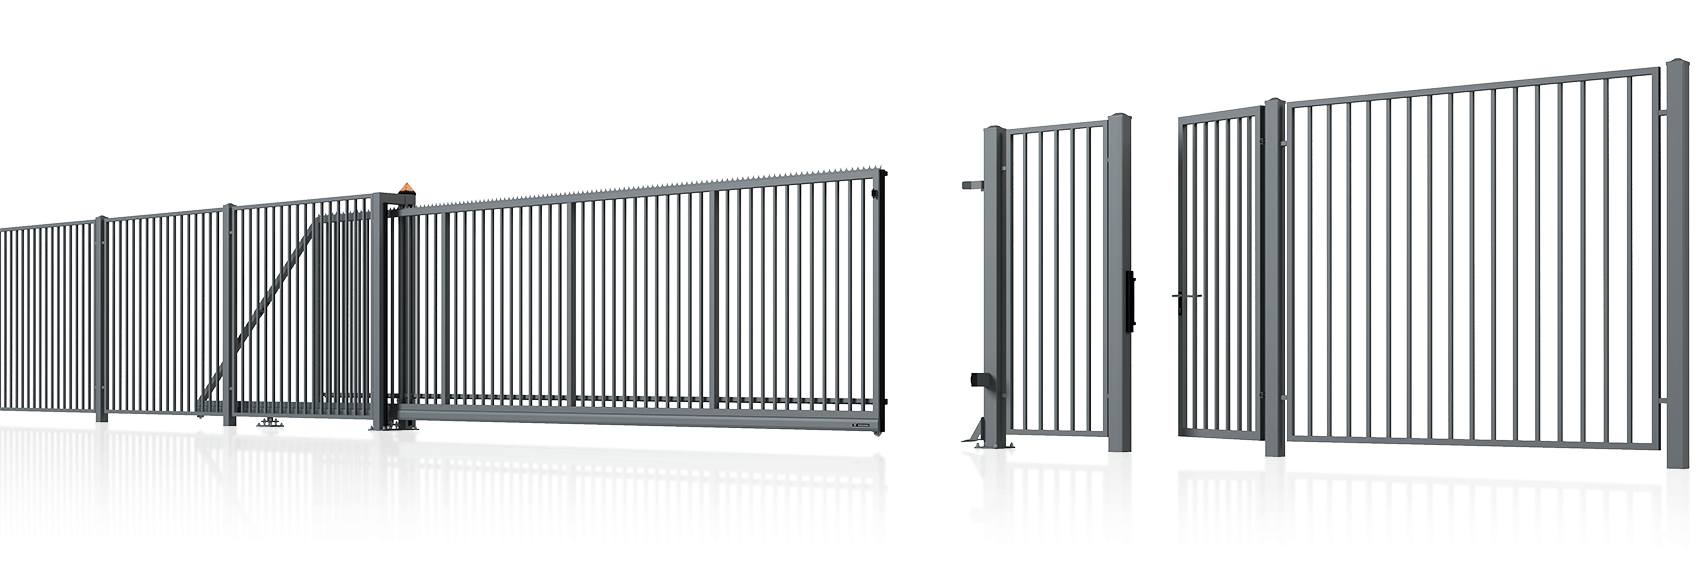 Industriella segment system_pi95